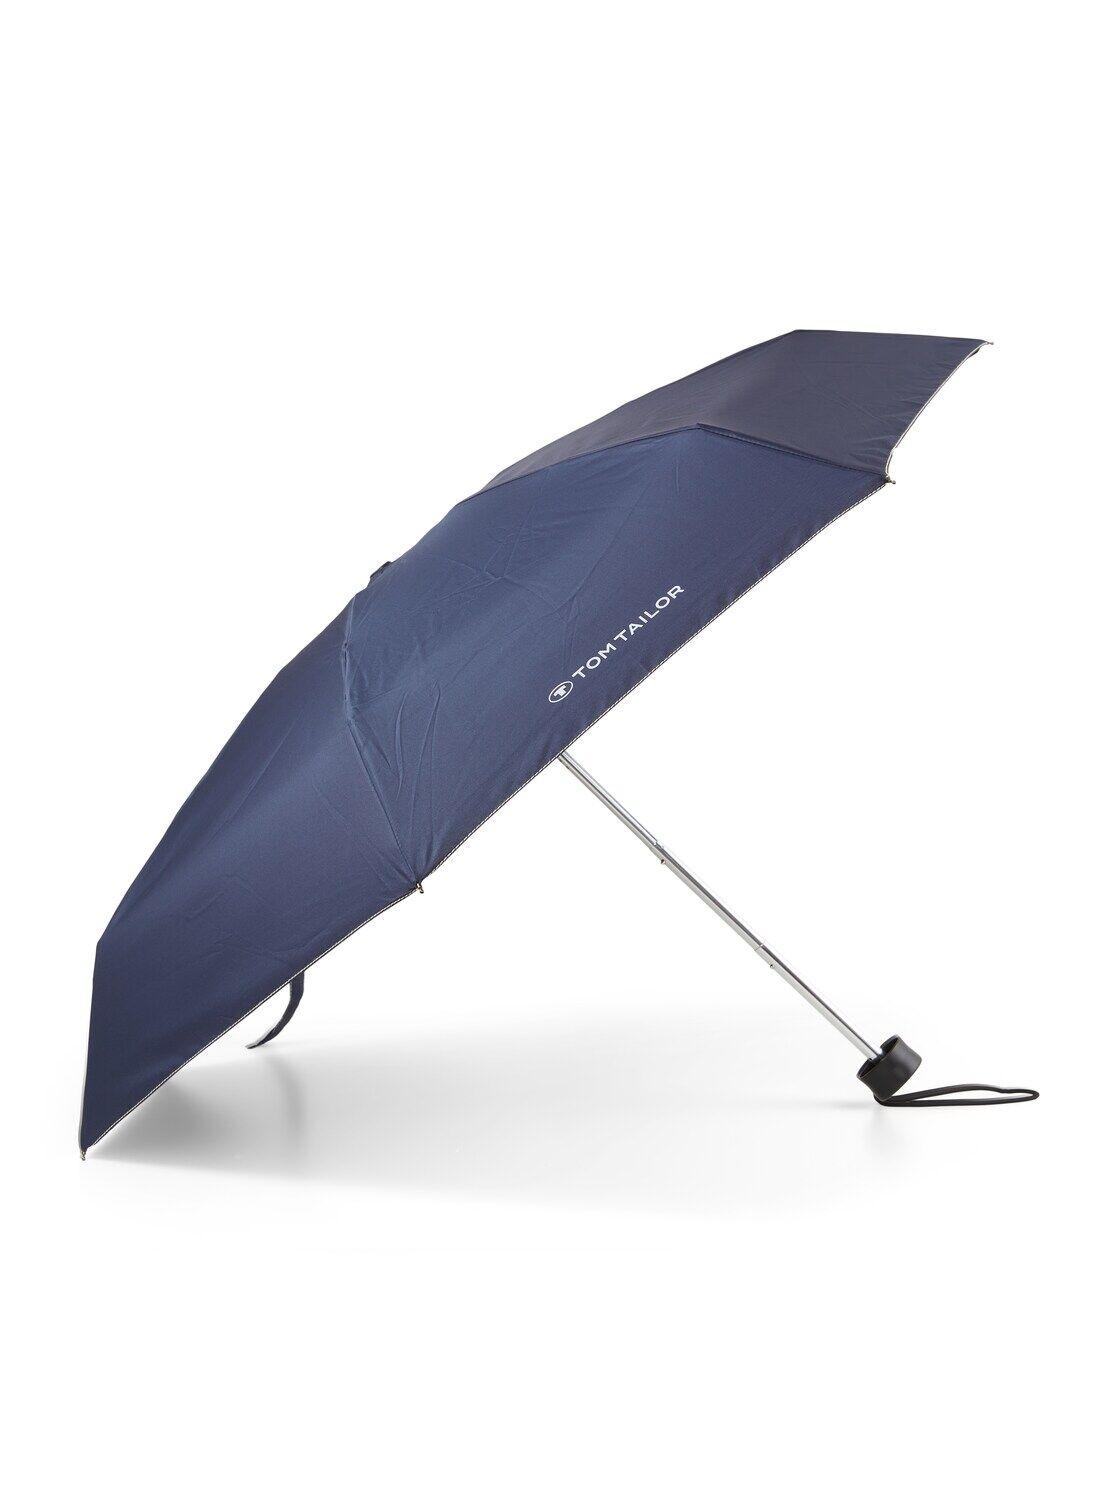 TOM TAILOR Unisex Ultra mini Taschenschirm, blau, unifarben, Gr.OneSize